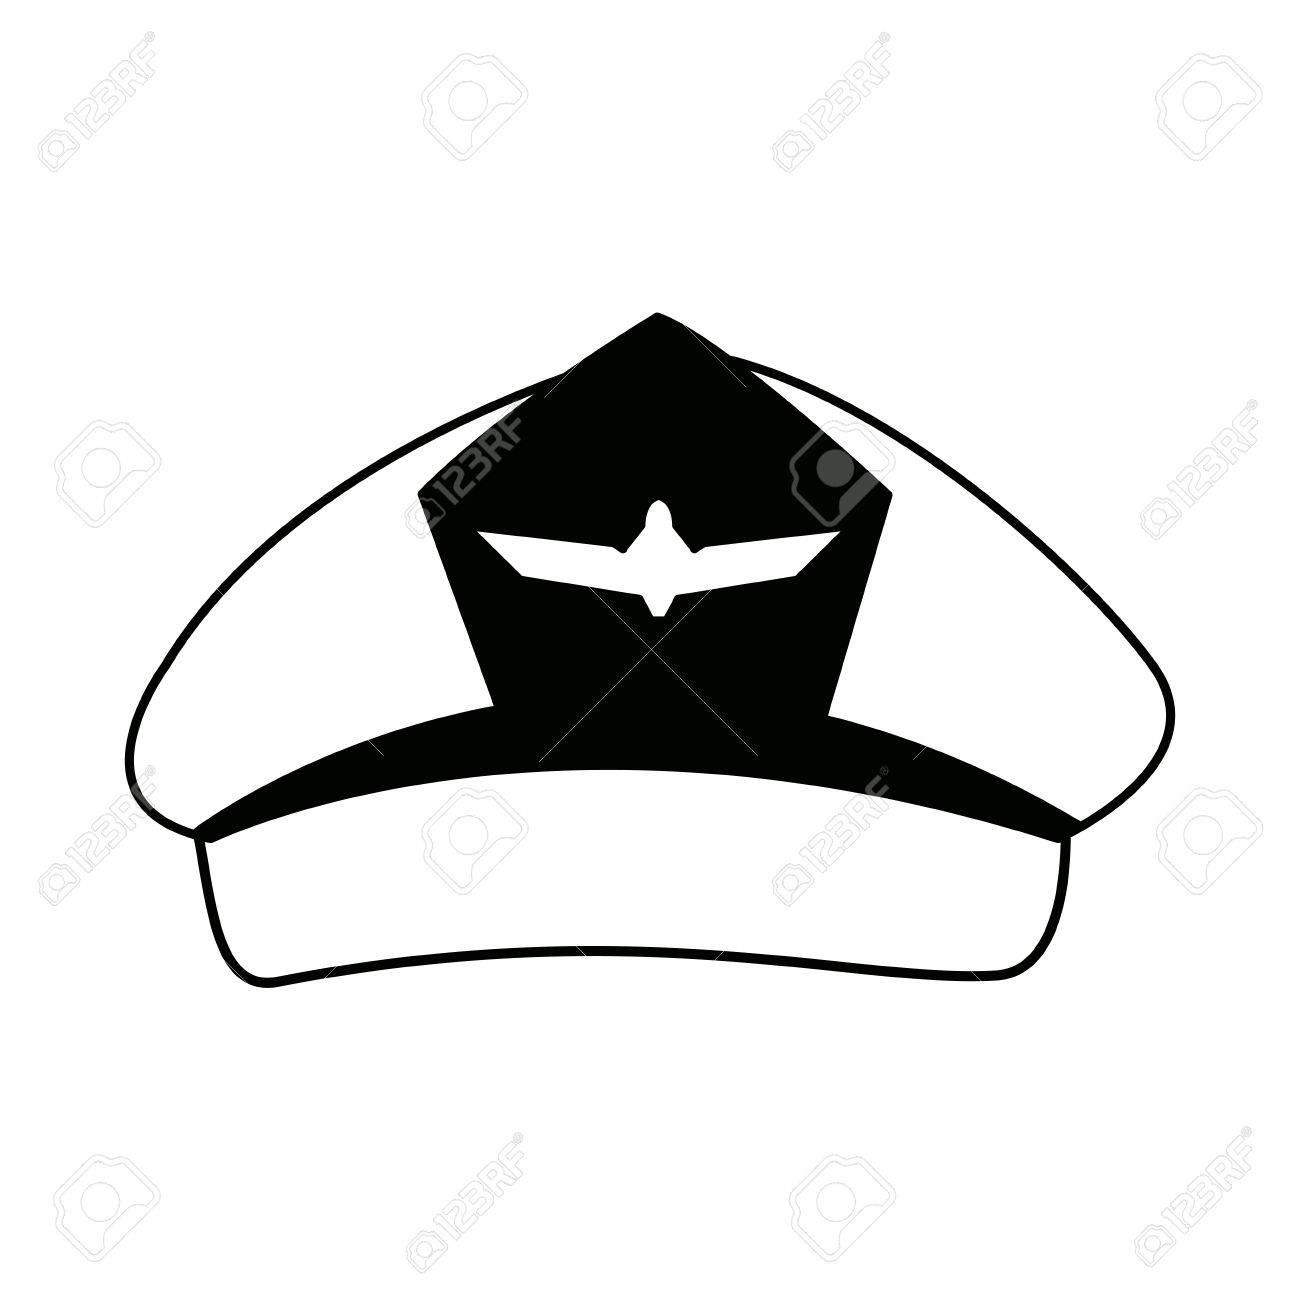 Pilotos De La Aviación Casquillo Aviador Sombrero Con Insignias ...